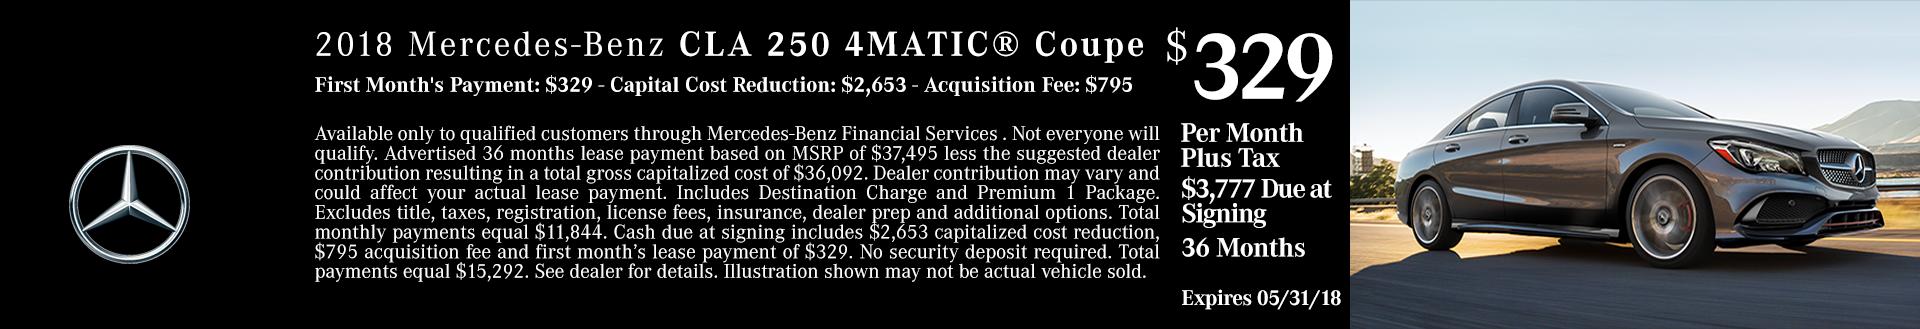 2018 CLA 250 4MATIC Car For Sale Boise